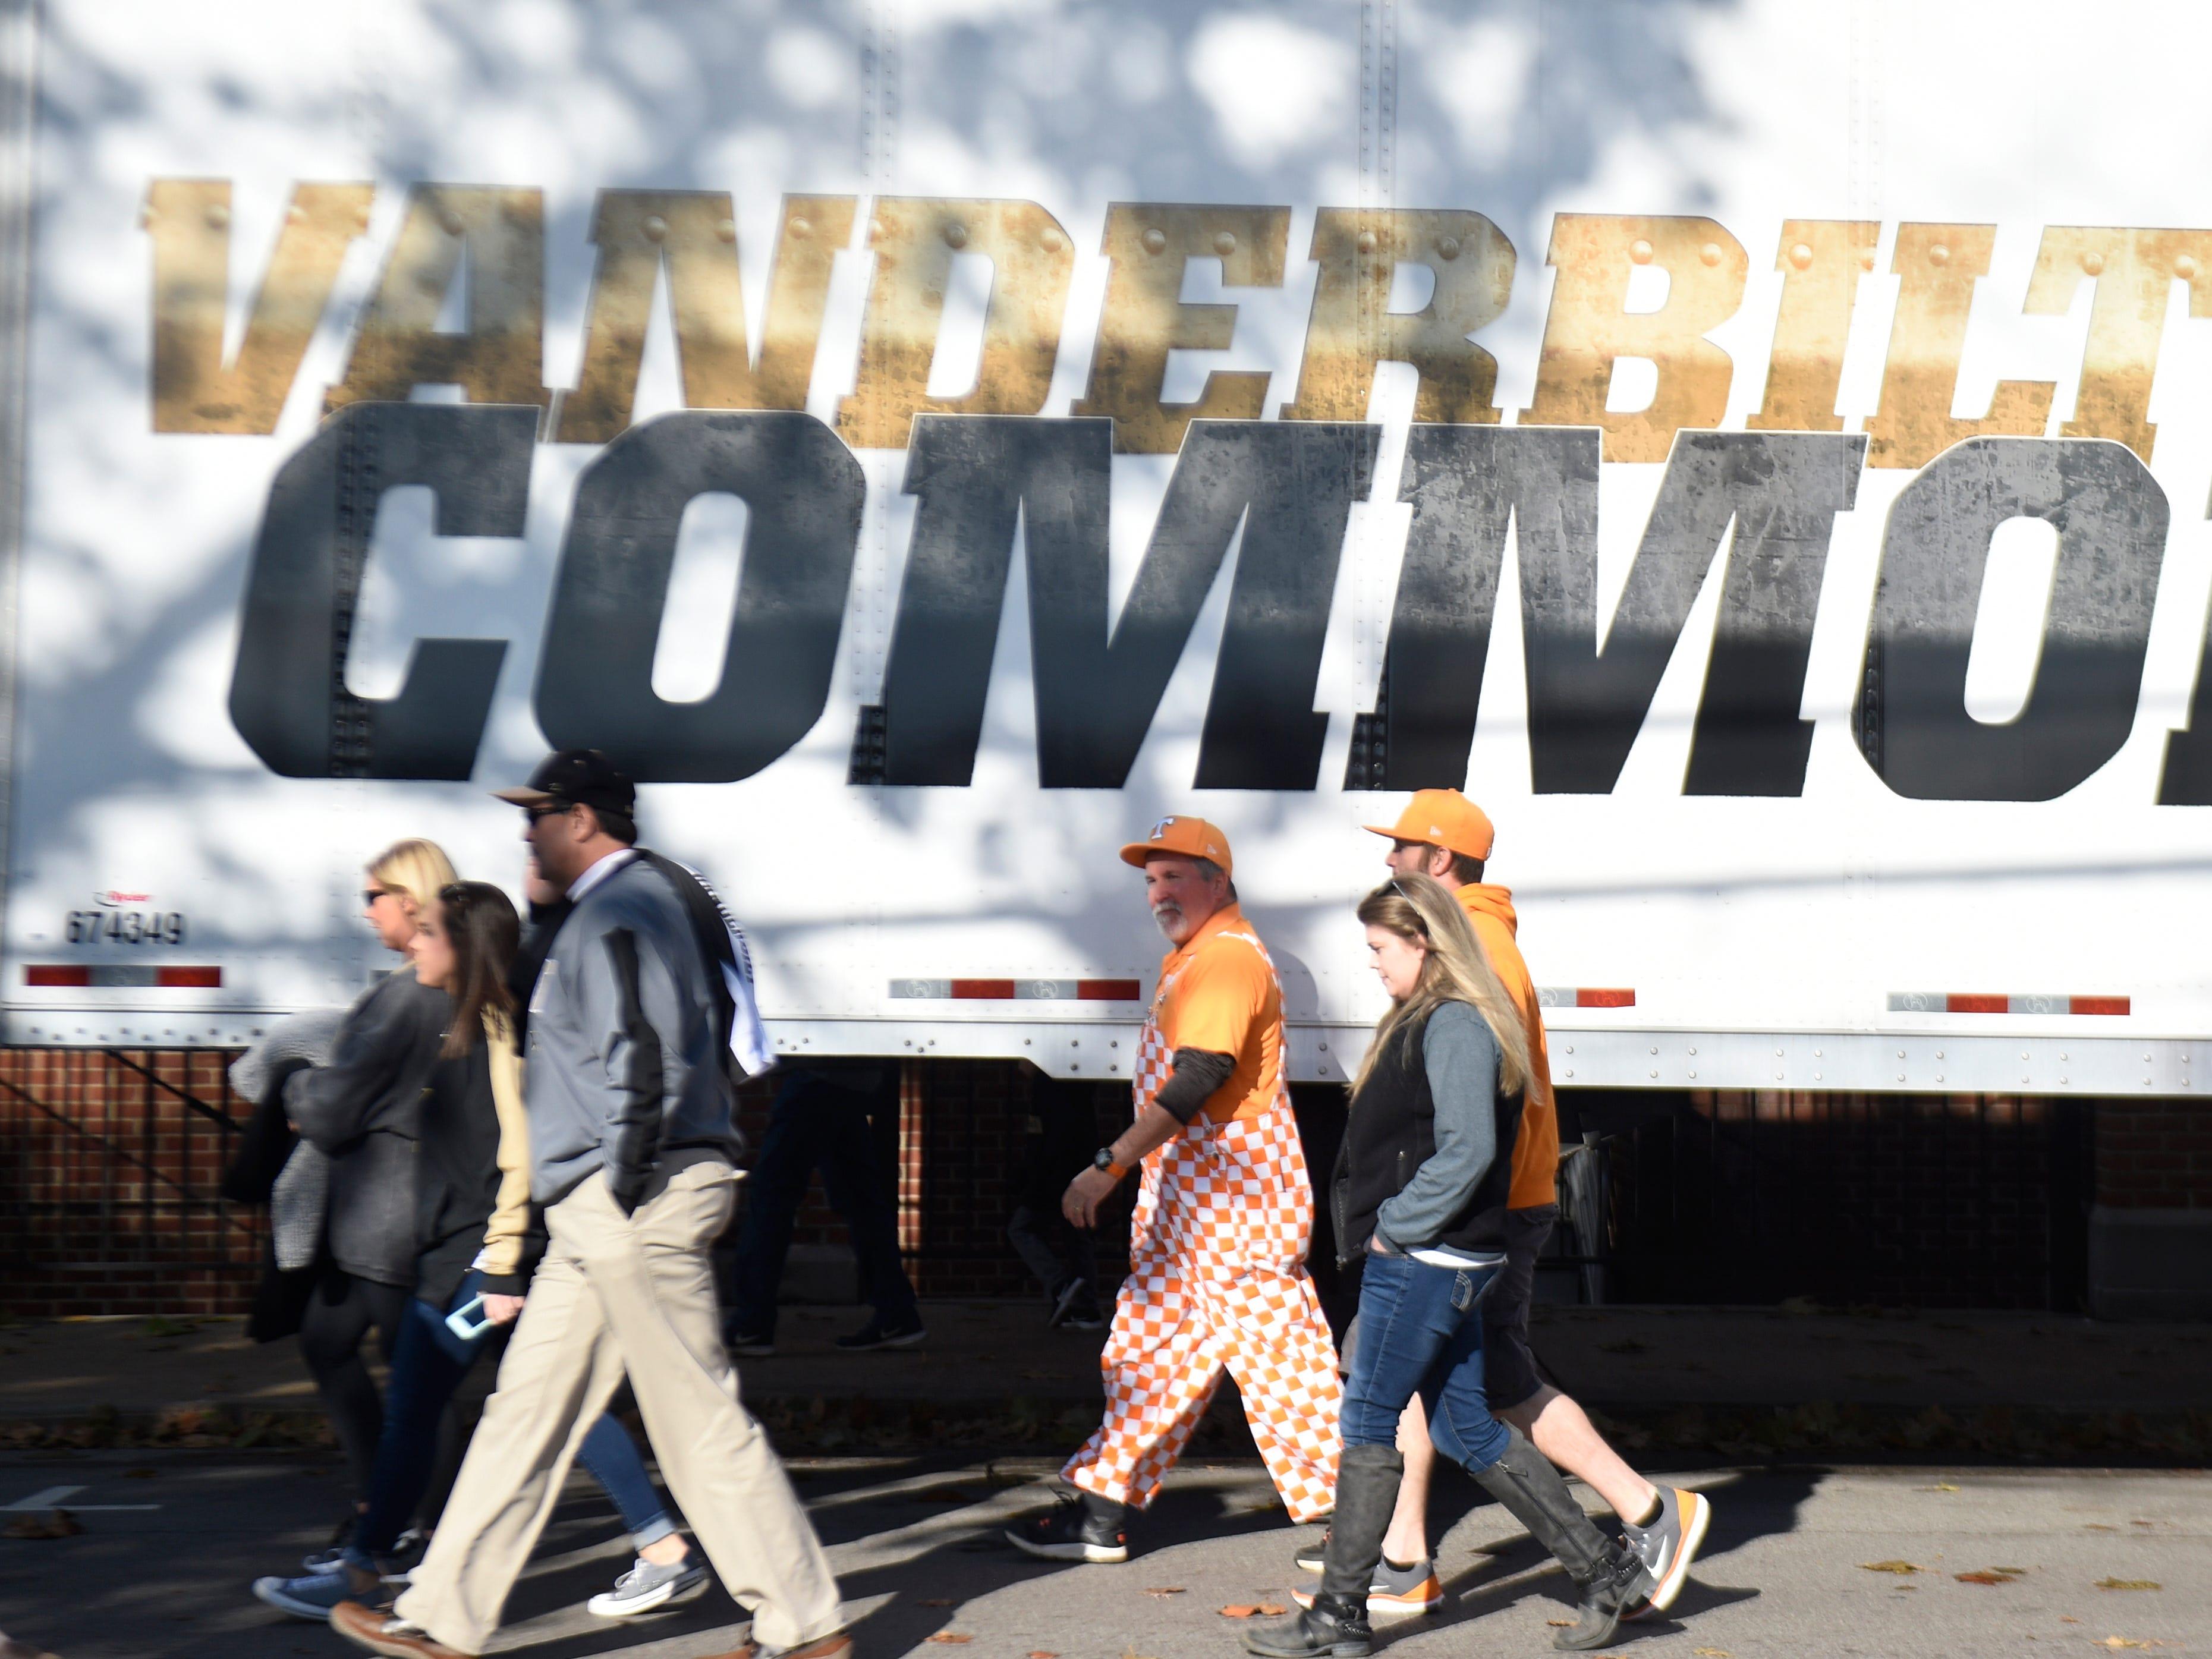 Vols fans walk past a Vandy sign before the game at Vanderbilt Stadium Saturday, Nov. 24, 2018, in Nashville, Tenn.